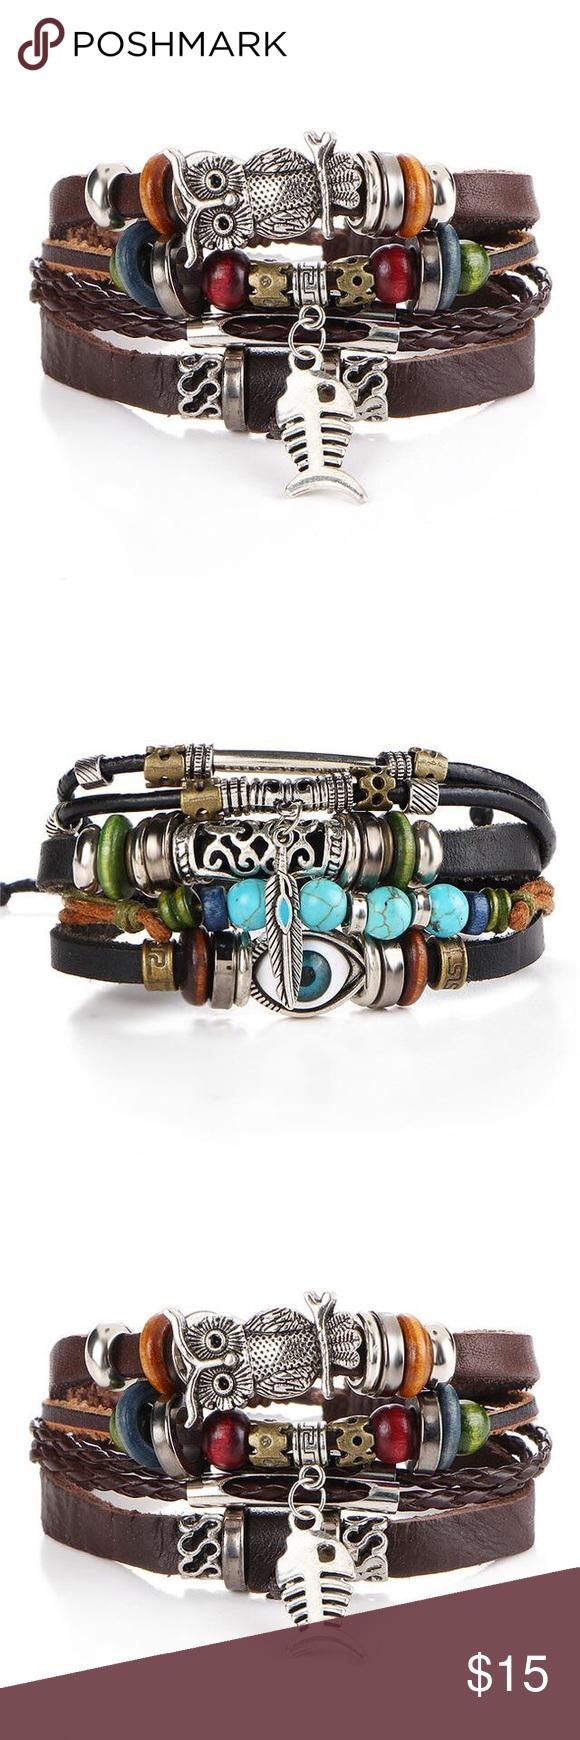 Punk design turkish eye bracelets for men u woman punk design